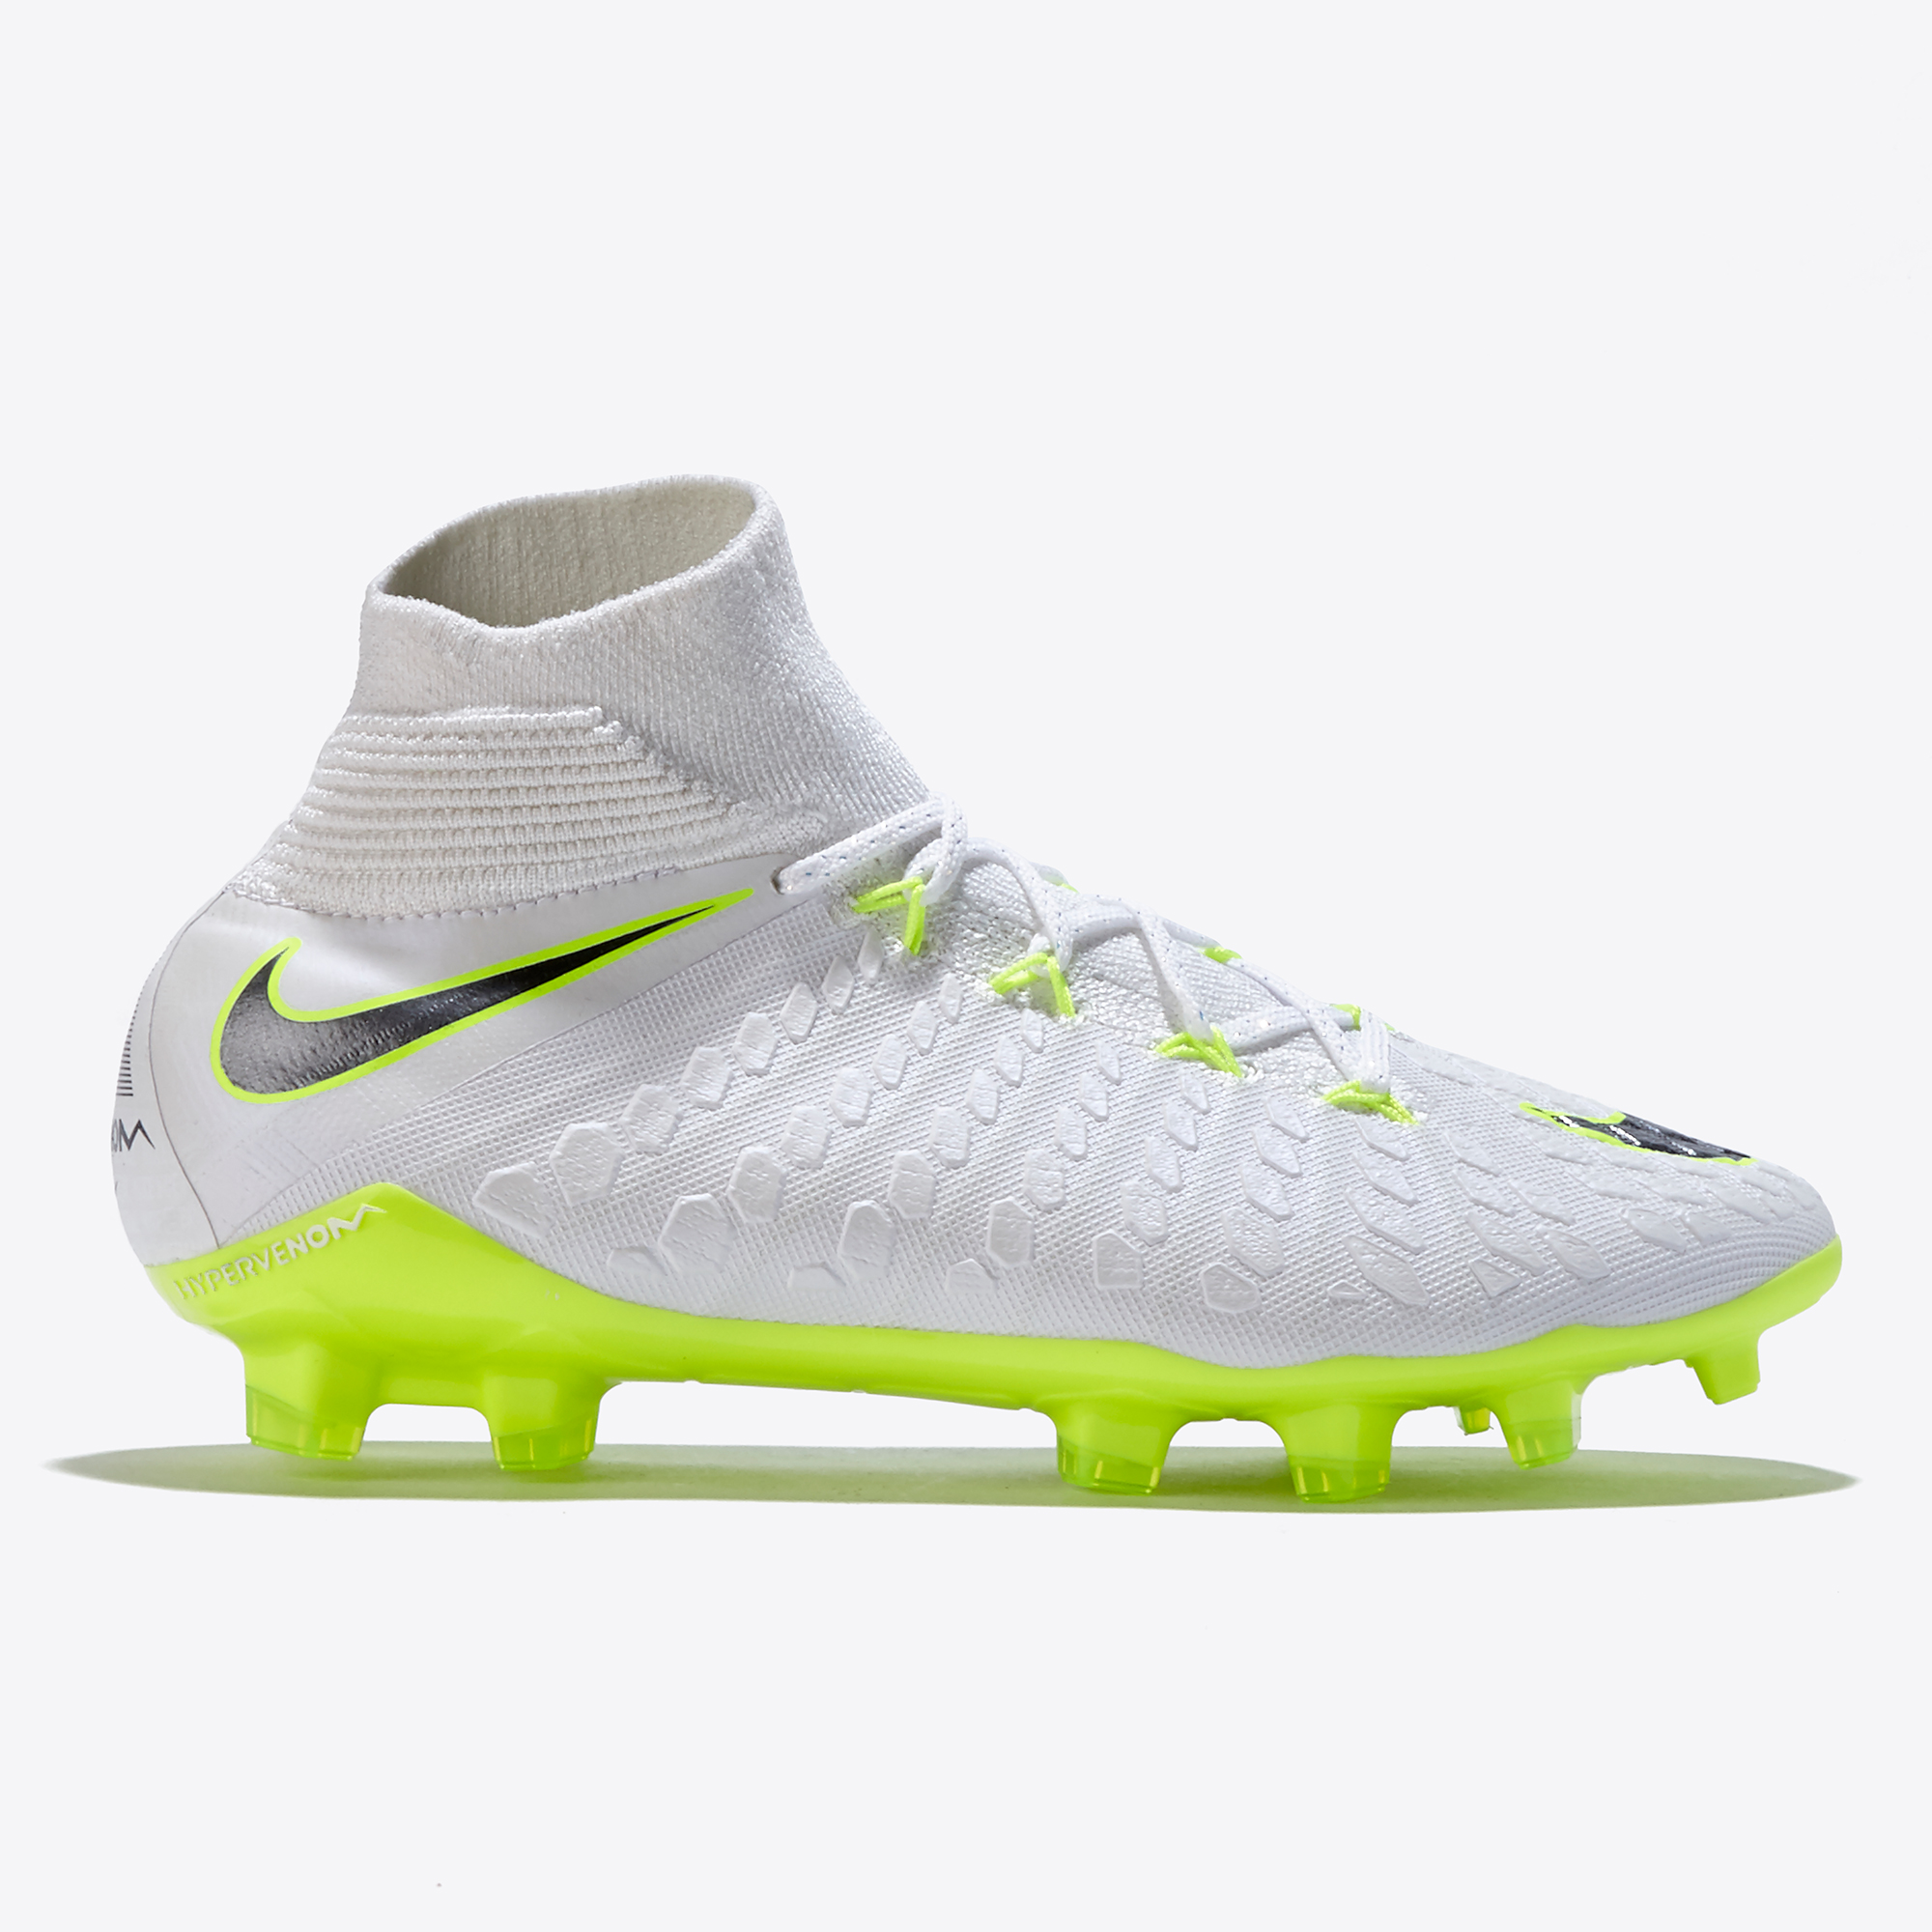 Chaussures de football pour terrain dur Nike Hypervenom Phantom3Elite Dynamic Fit - Enfant